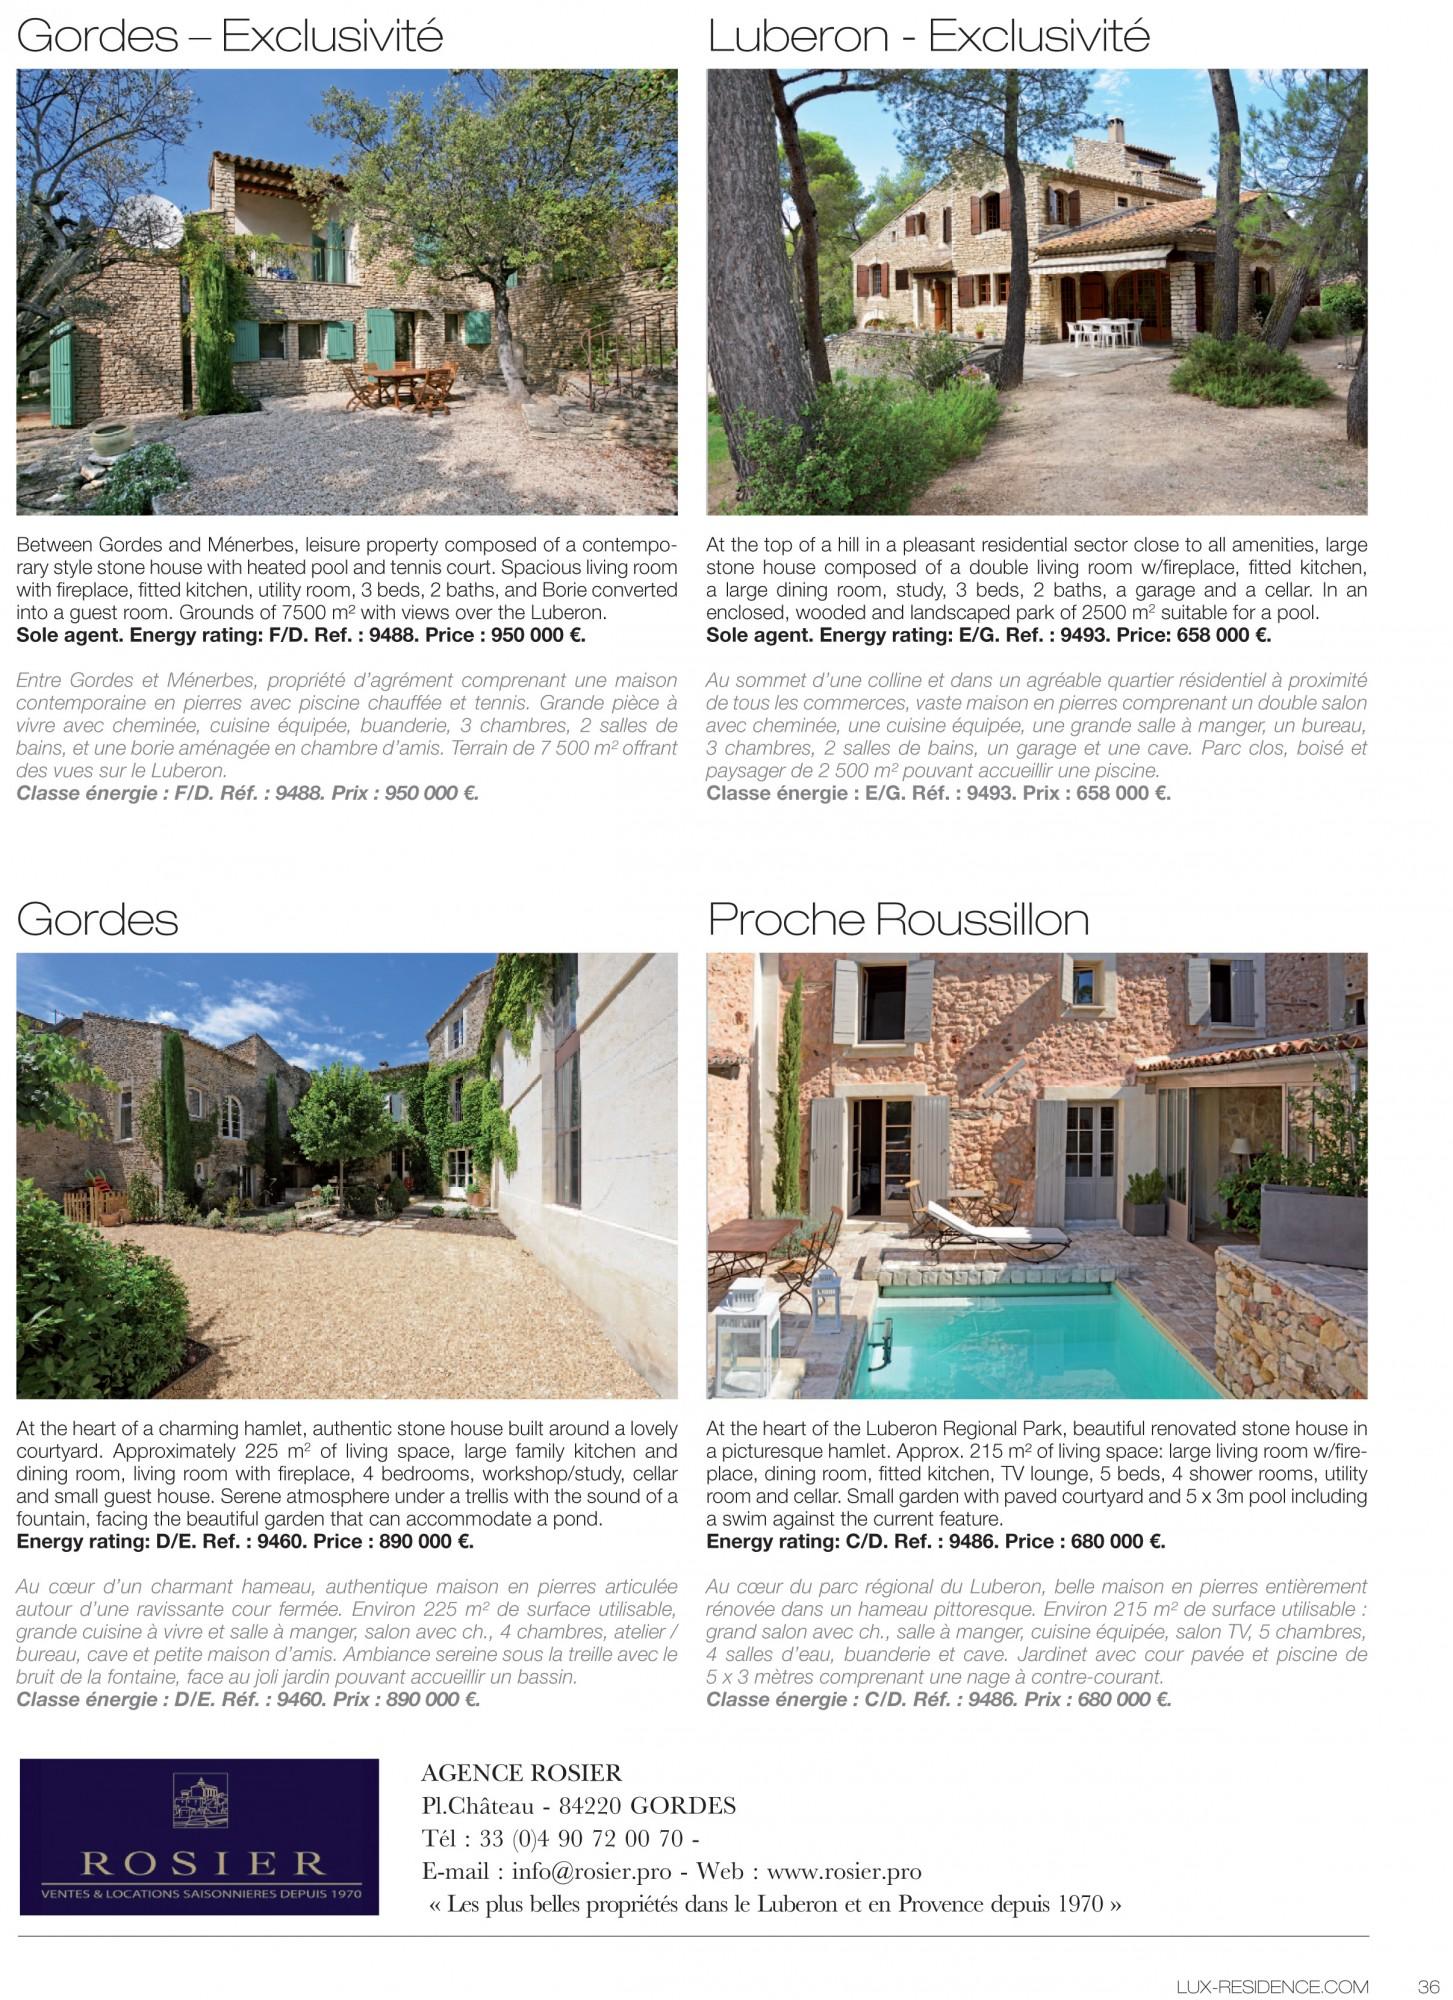 C Maison Et Jardin Magazine lux residence luxurious real estate magazine - rosier